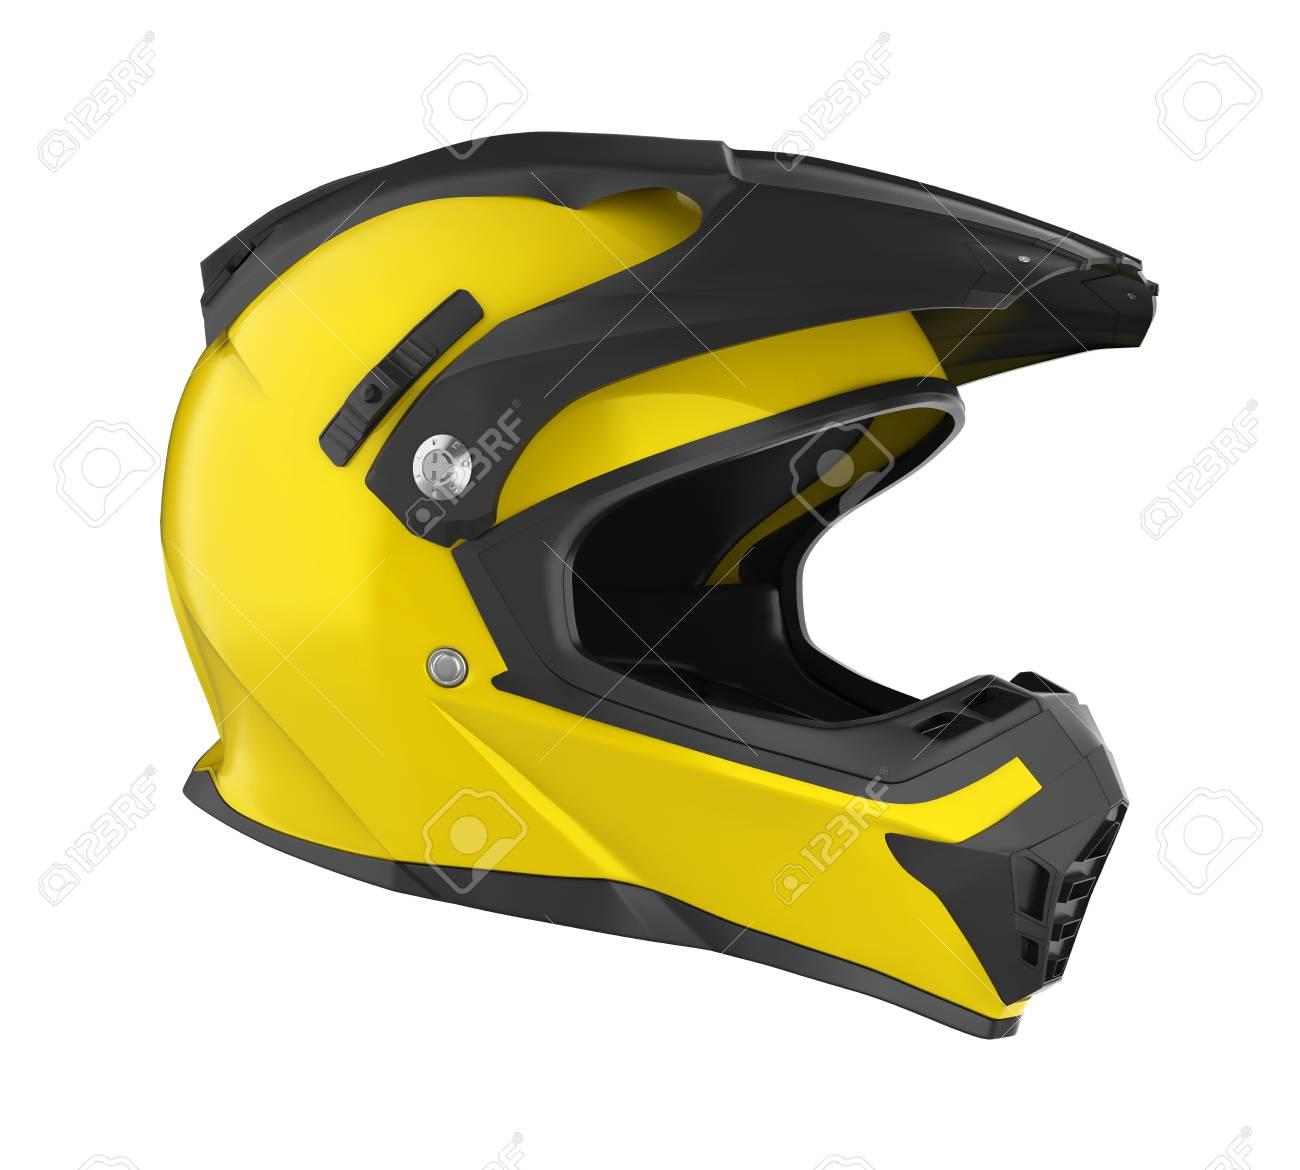 Motocross Helmet Isolated - 88034735